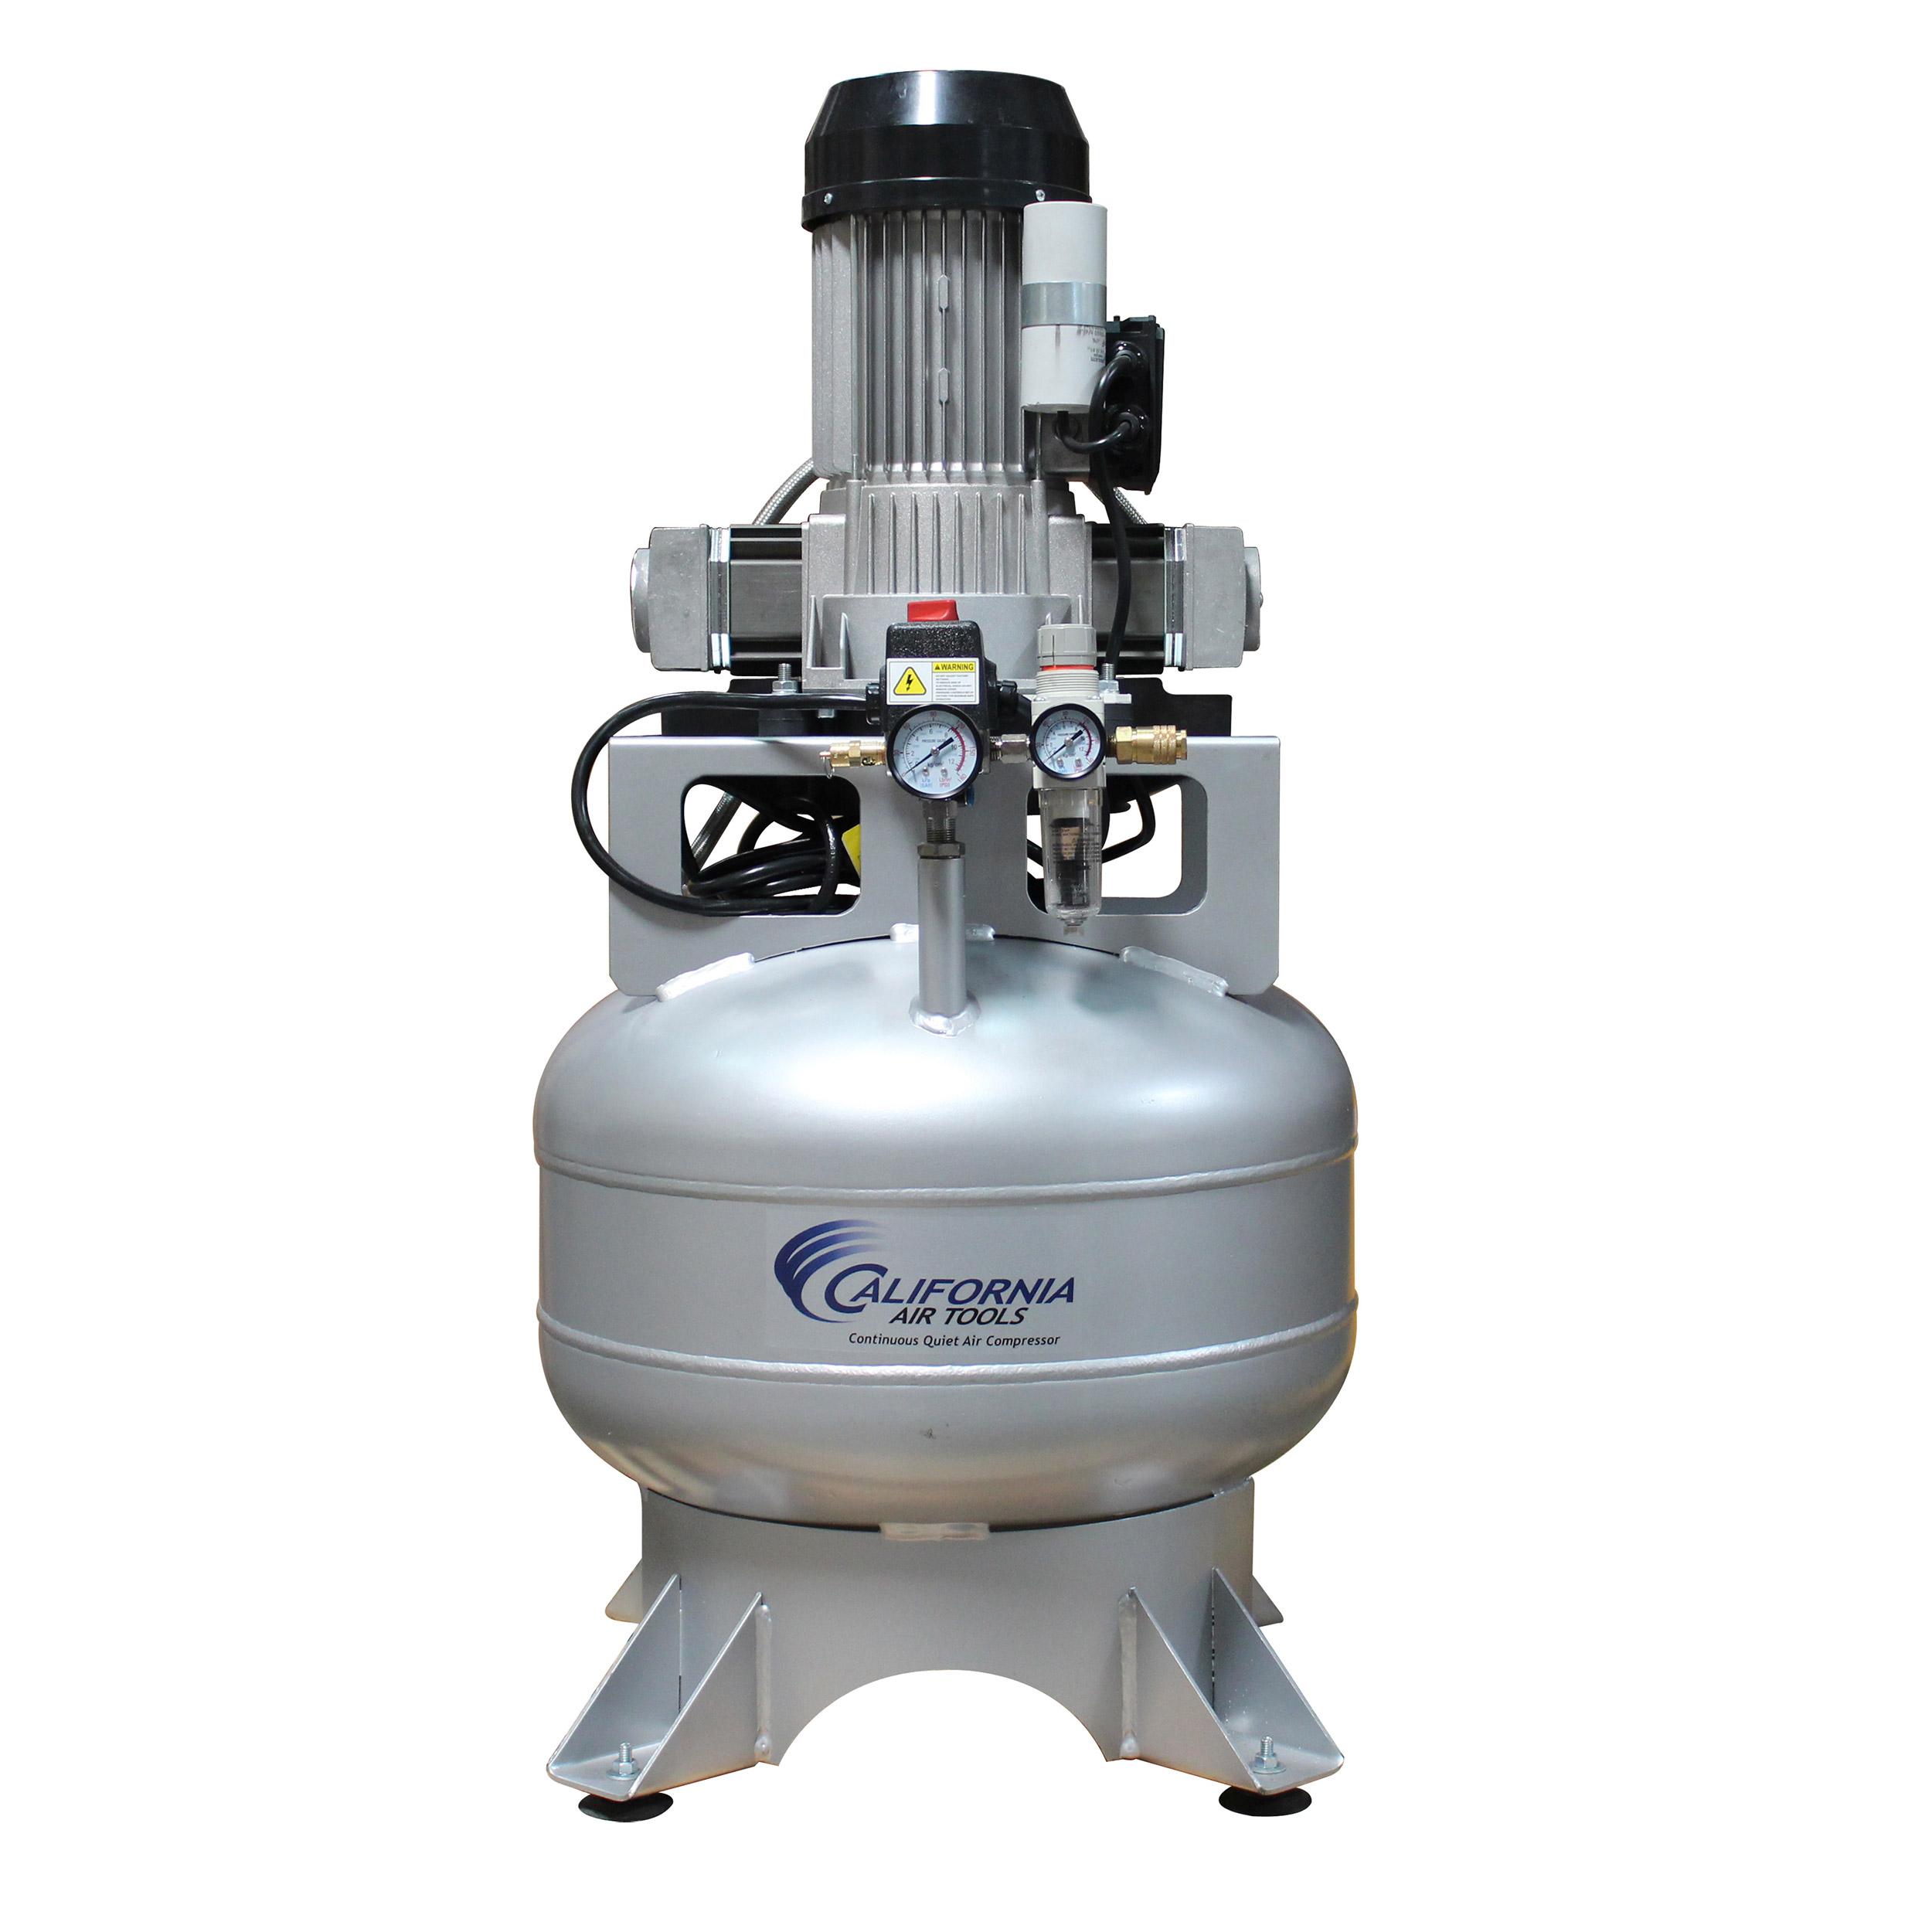 Steel Tank Continuous Air Compressor,  15020CR, Ultra Quiet  & Oil-Free,  2.0 Hp, 15 gallon